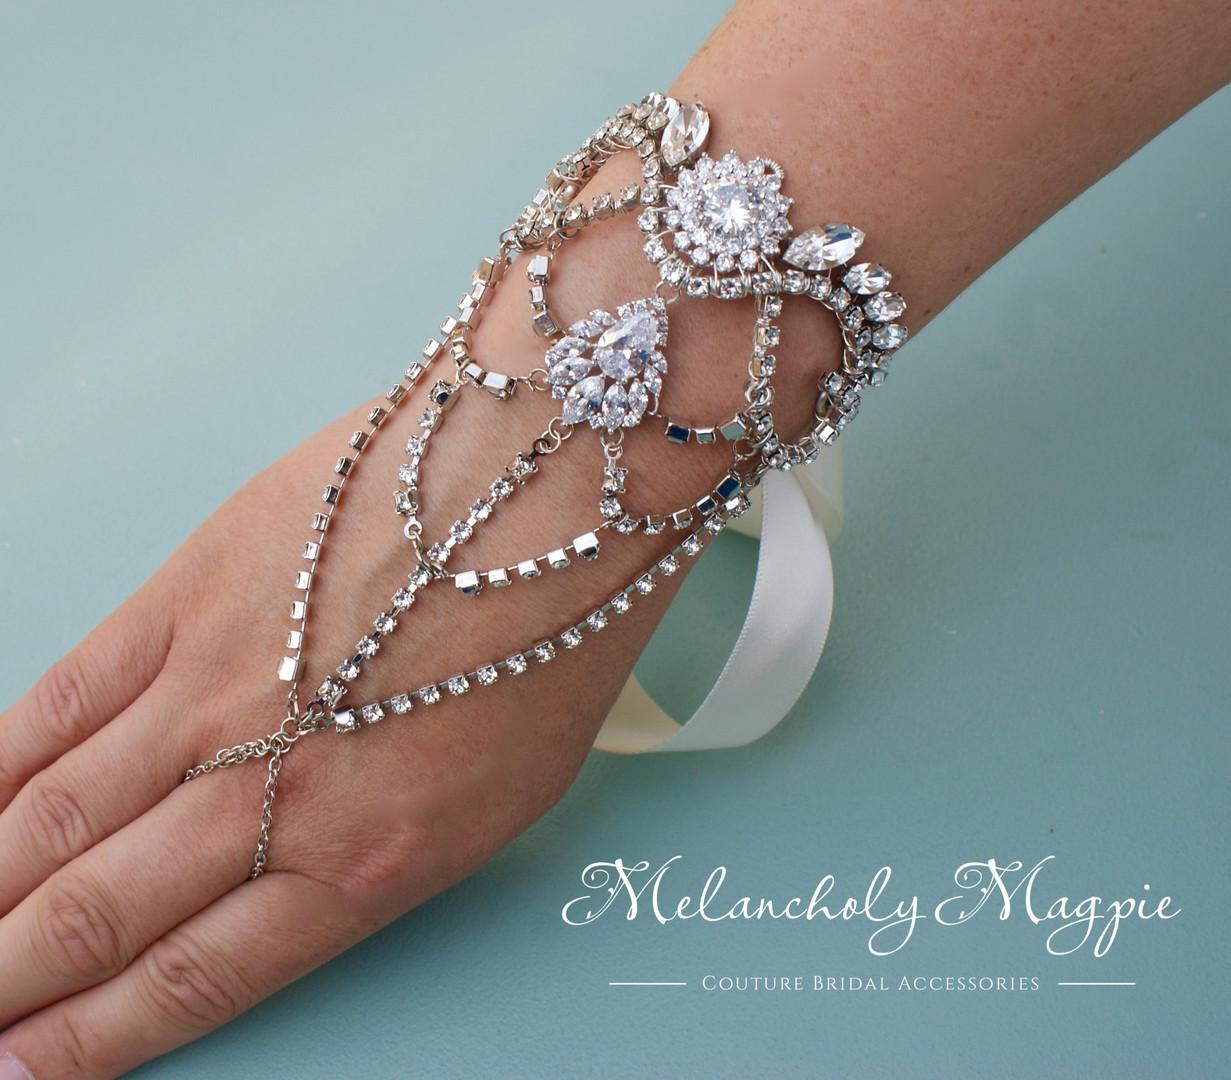 Bespoke wrist/hand piece